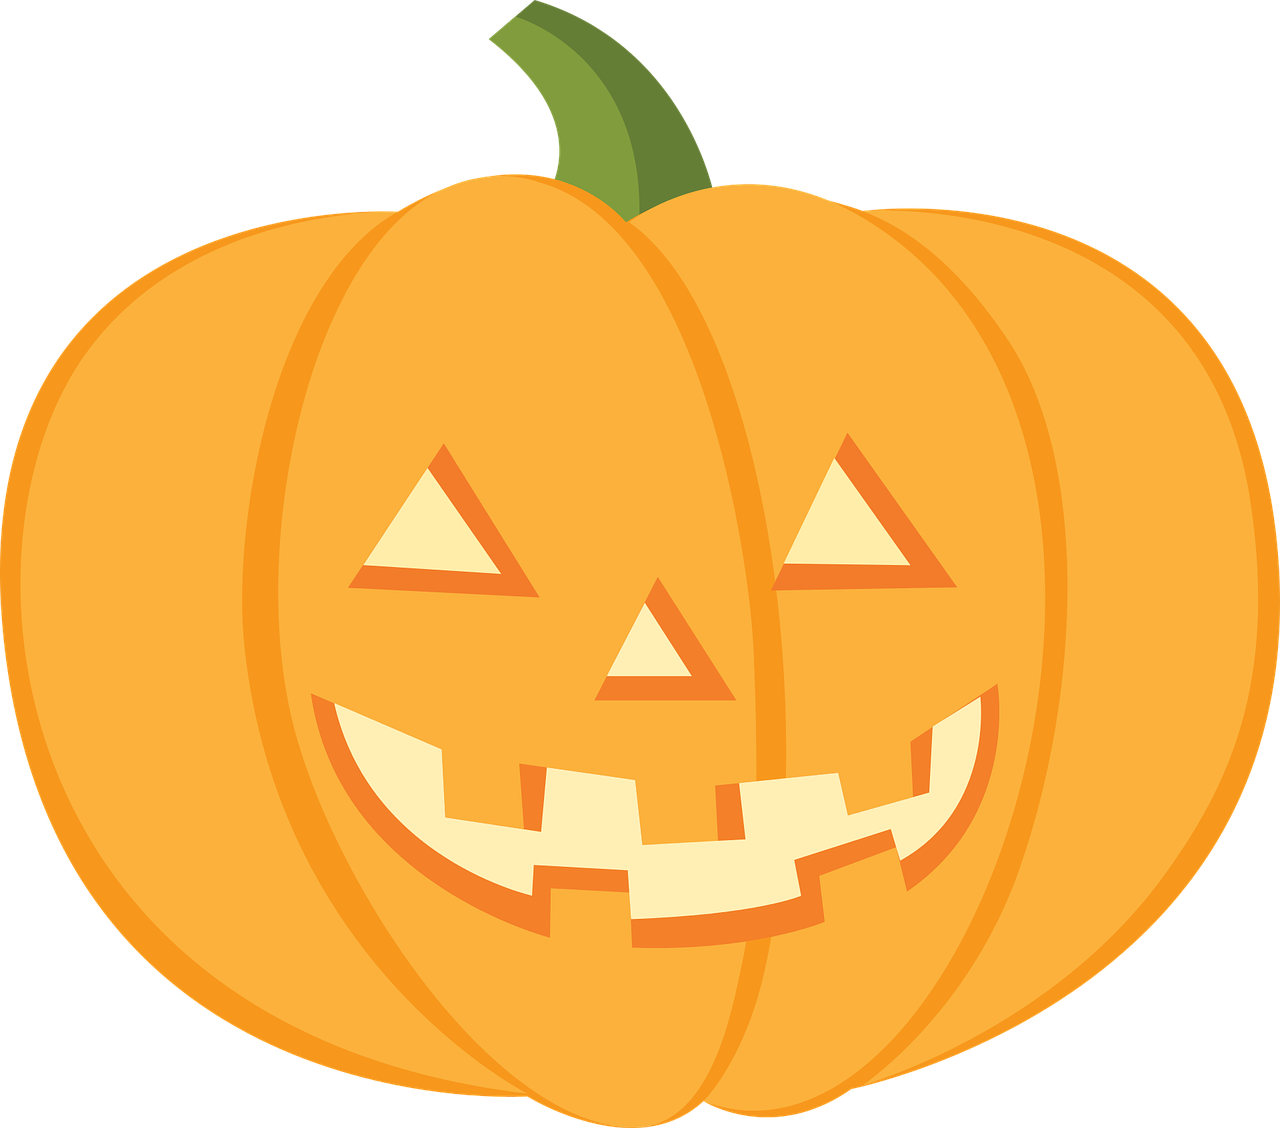 Halloween town pumpkin clipart image transparent HAUNTED HALLOWEEN HAPPENINGS: OCT 27-28 - Wade Tours Bus Tours image transparent